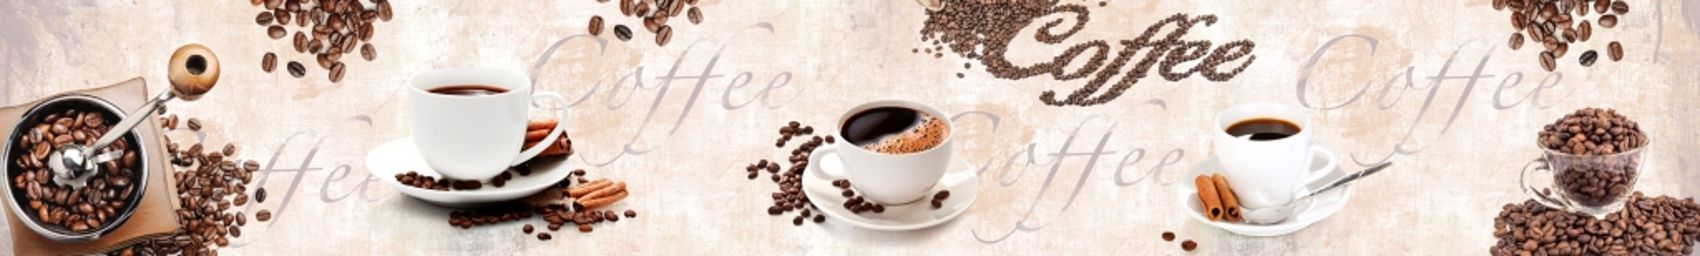 Белые чашки с кофе